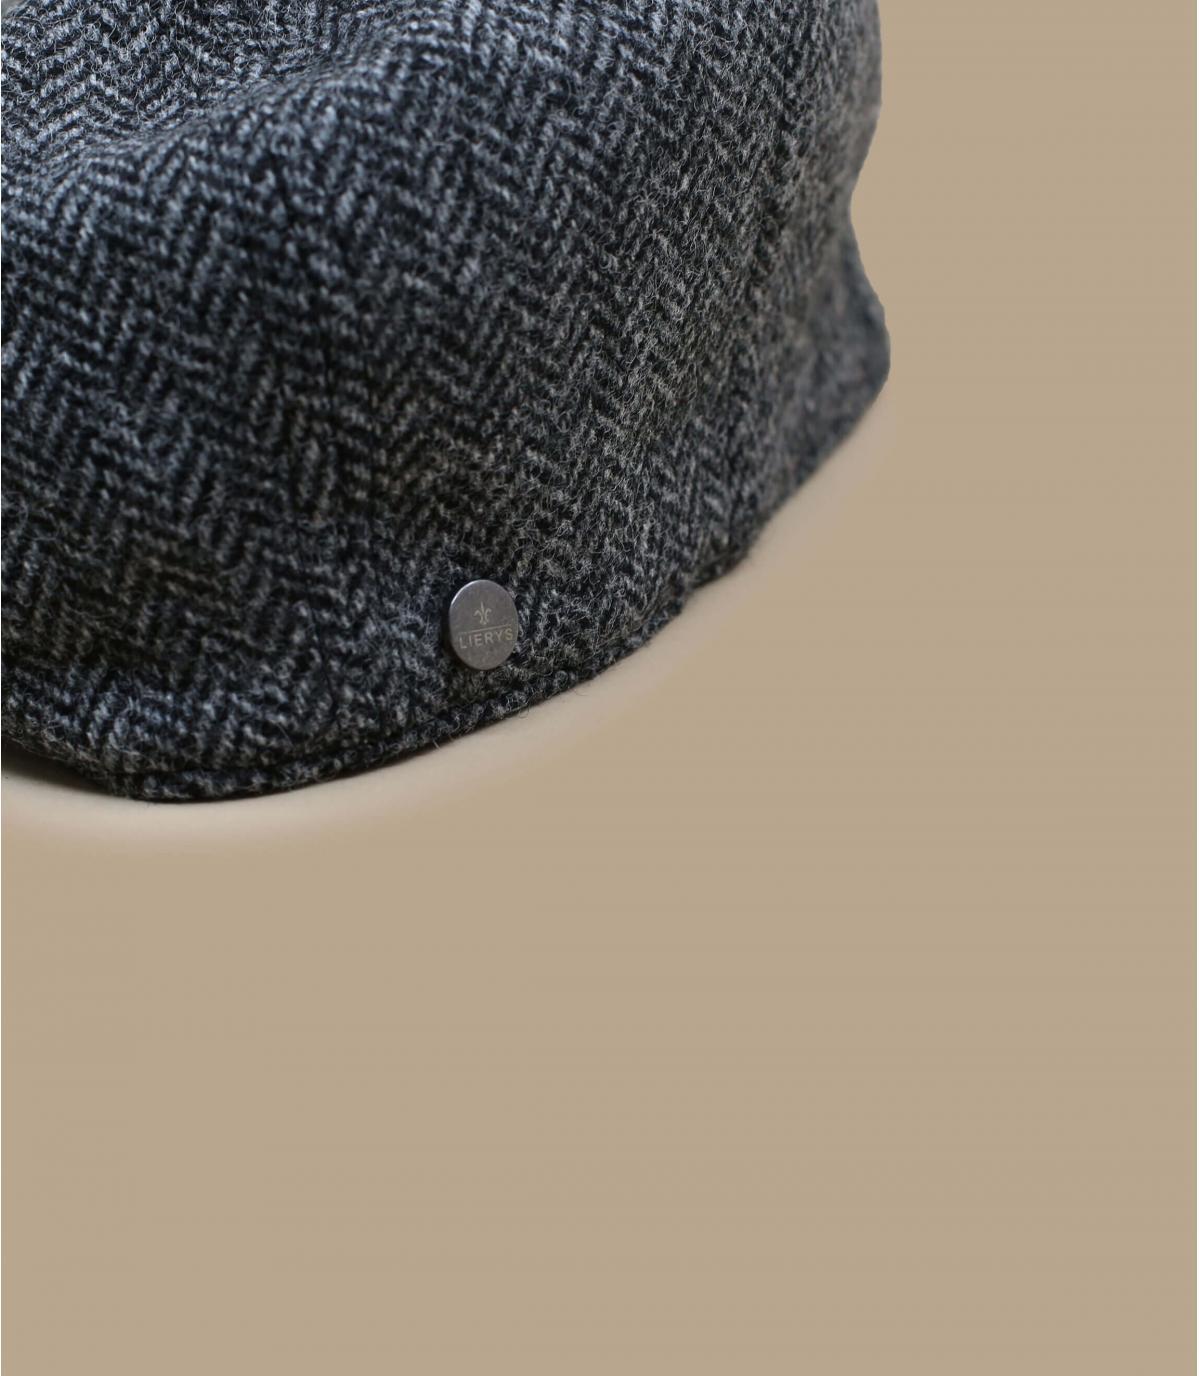 Détails Britton Wool Herringbone grey - image 2